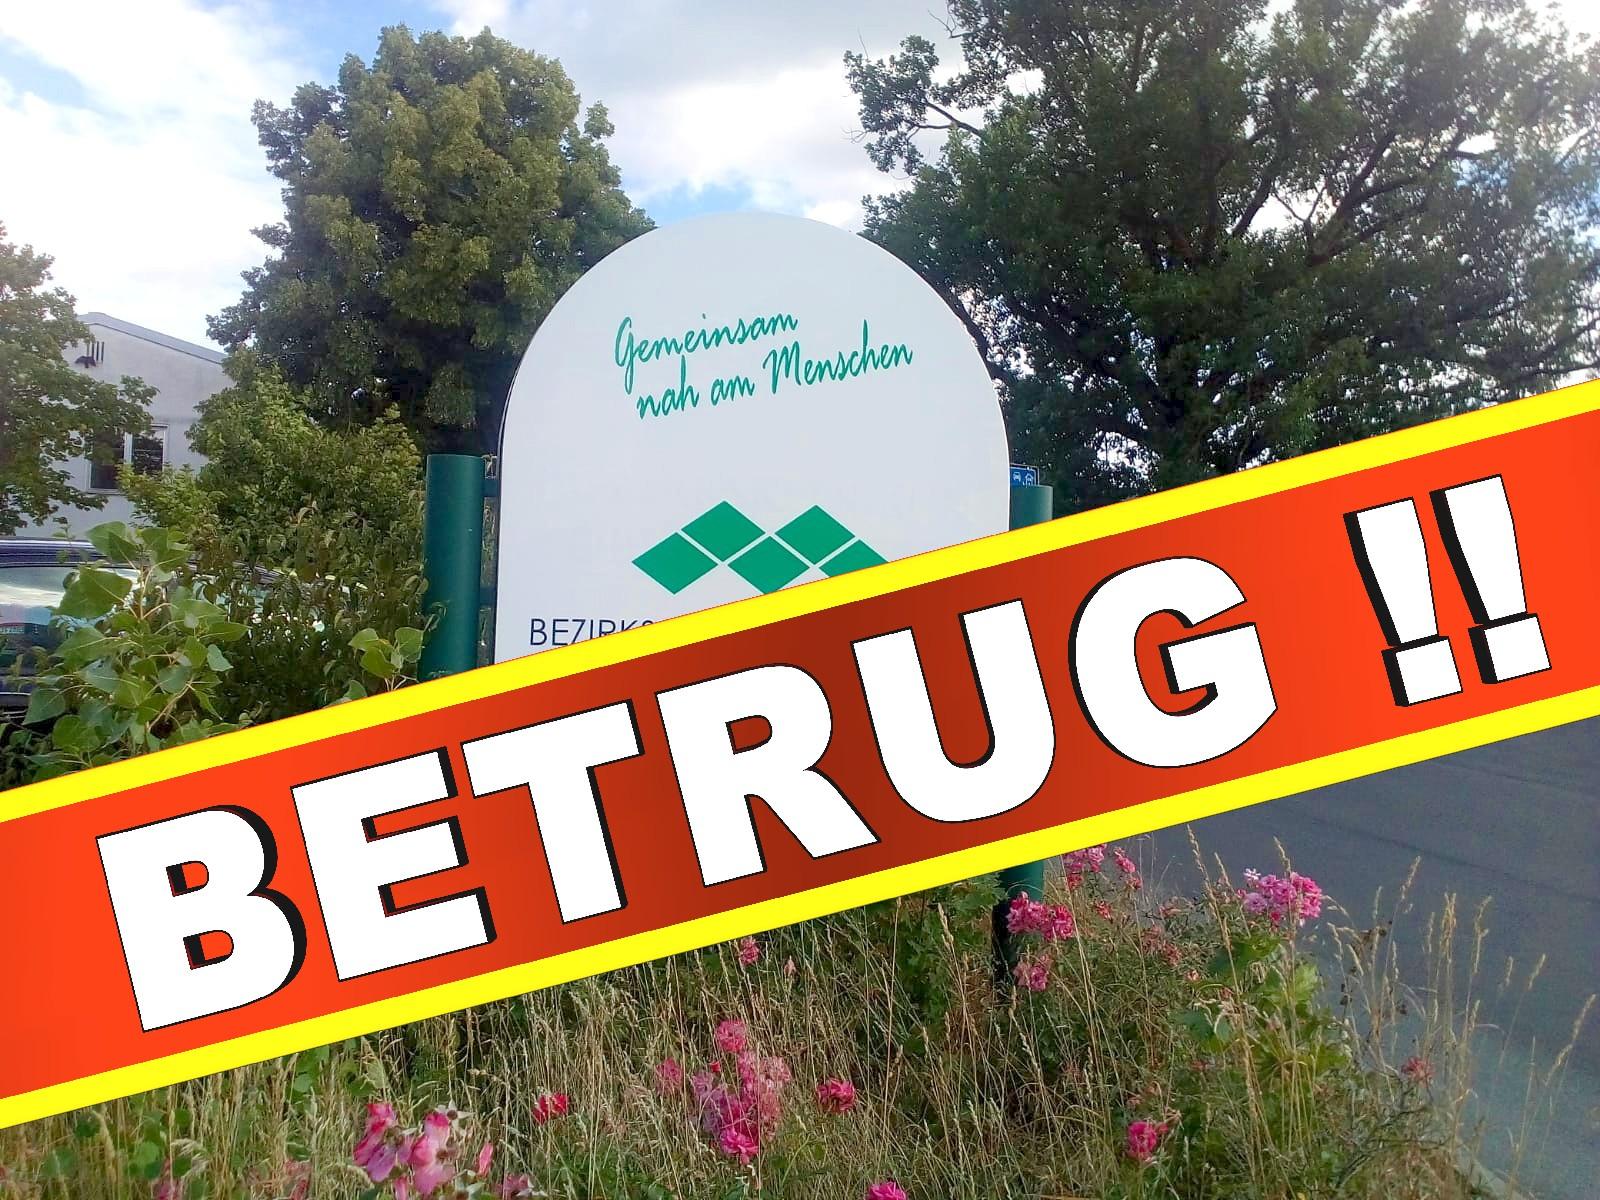 Bezirksklinikum Obermain Kutzenberg, 96250 Ebensfeld Psychiatrie Polizei Krankenhaus (52)